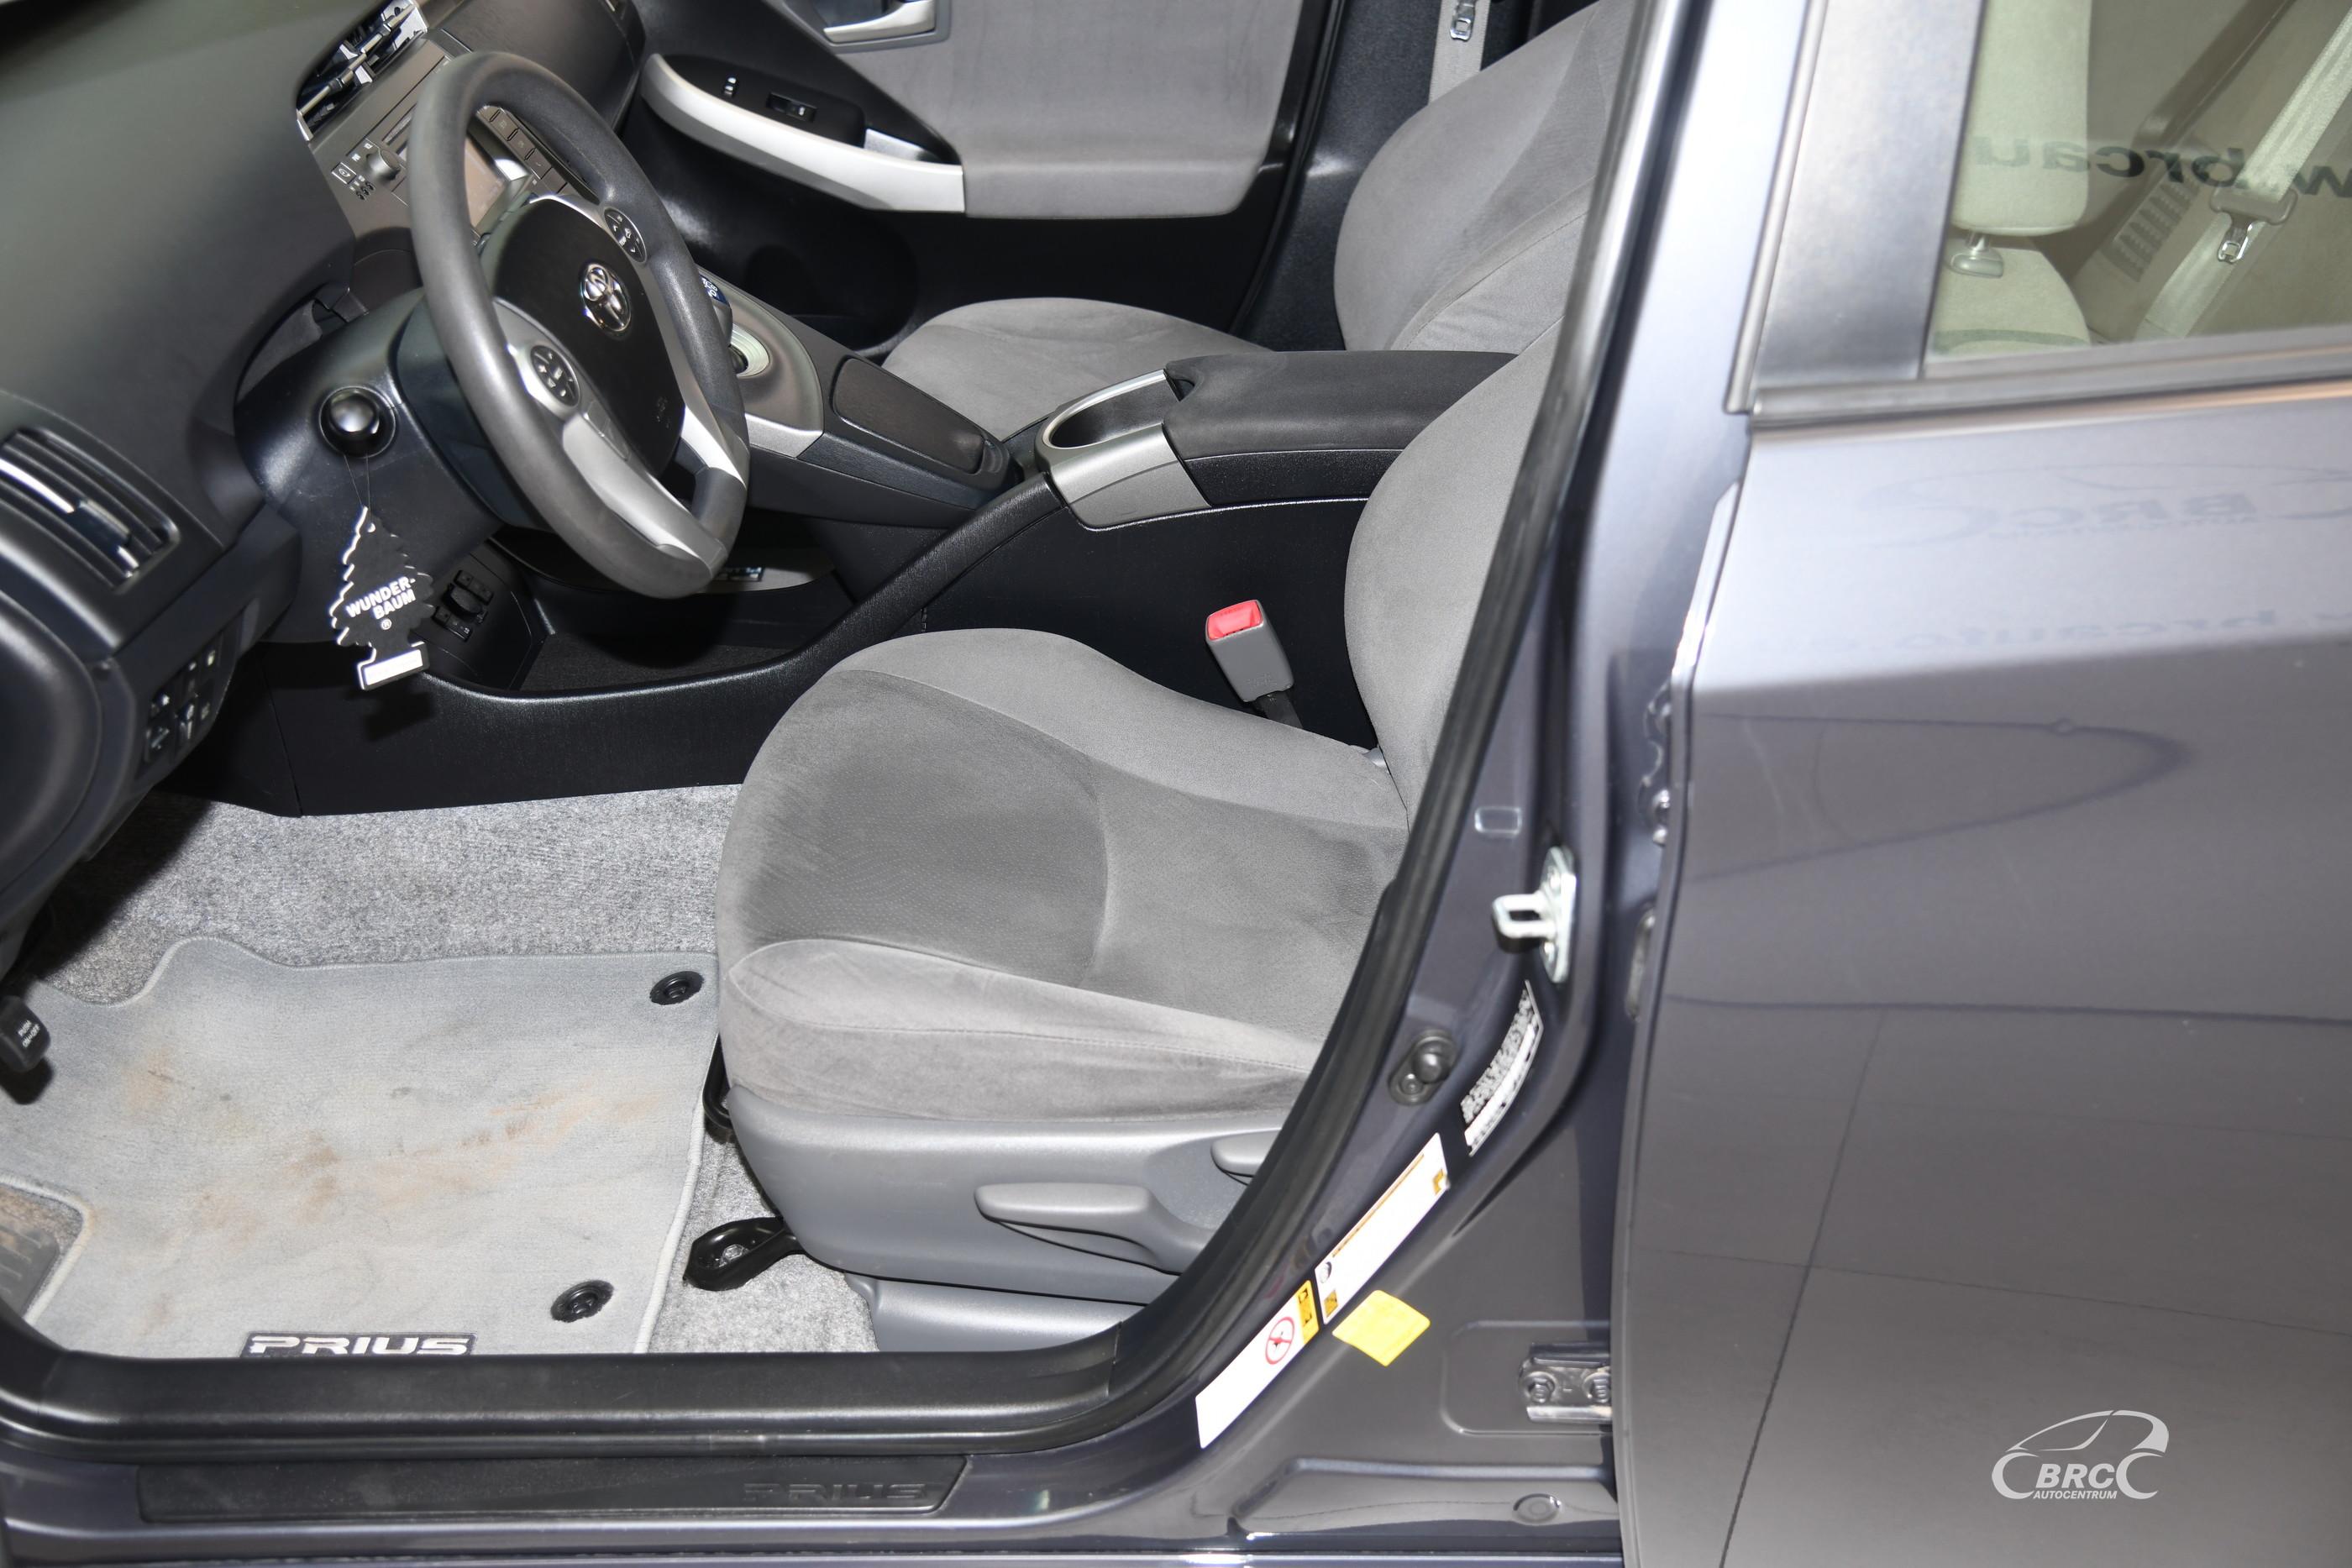 Toyota Prius 1.8i Plug-In Hybrid Automatas